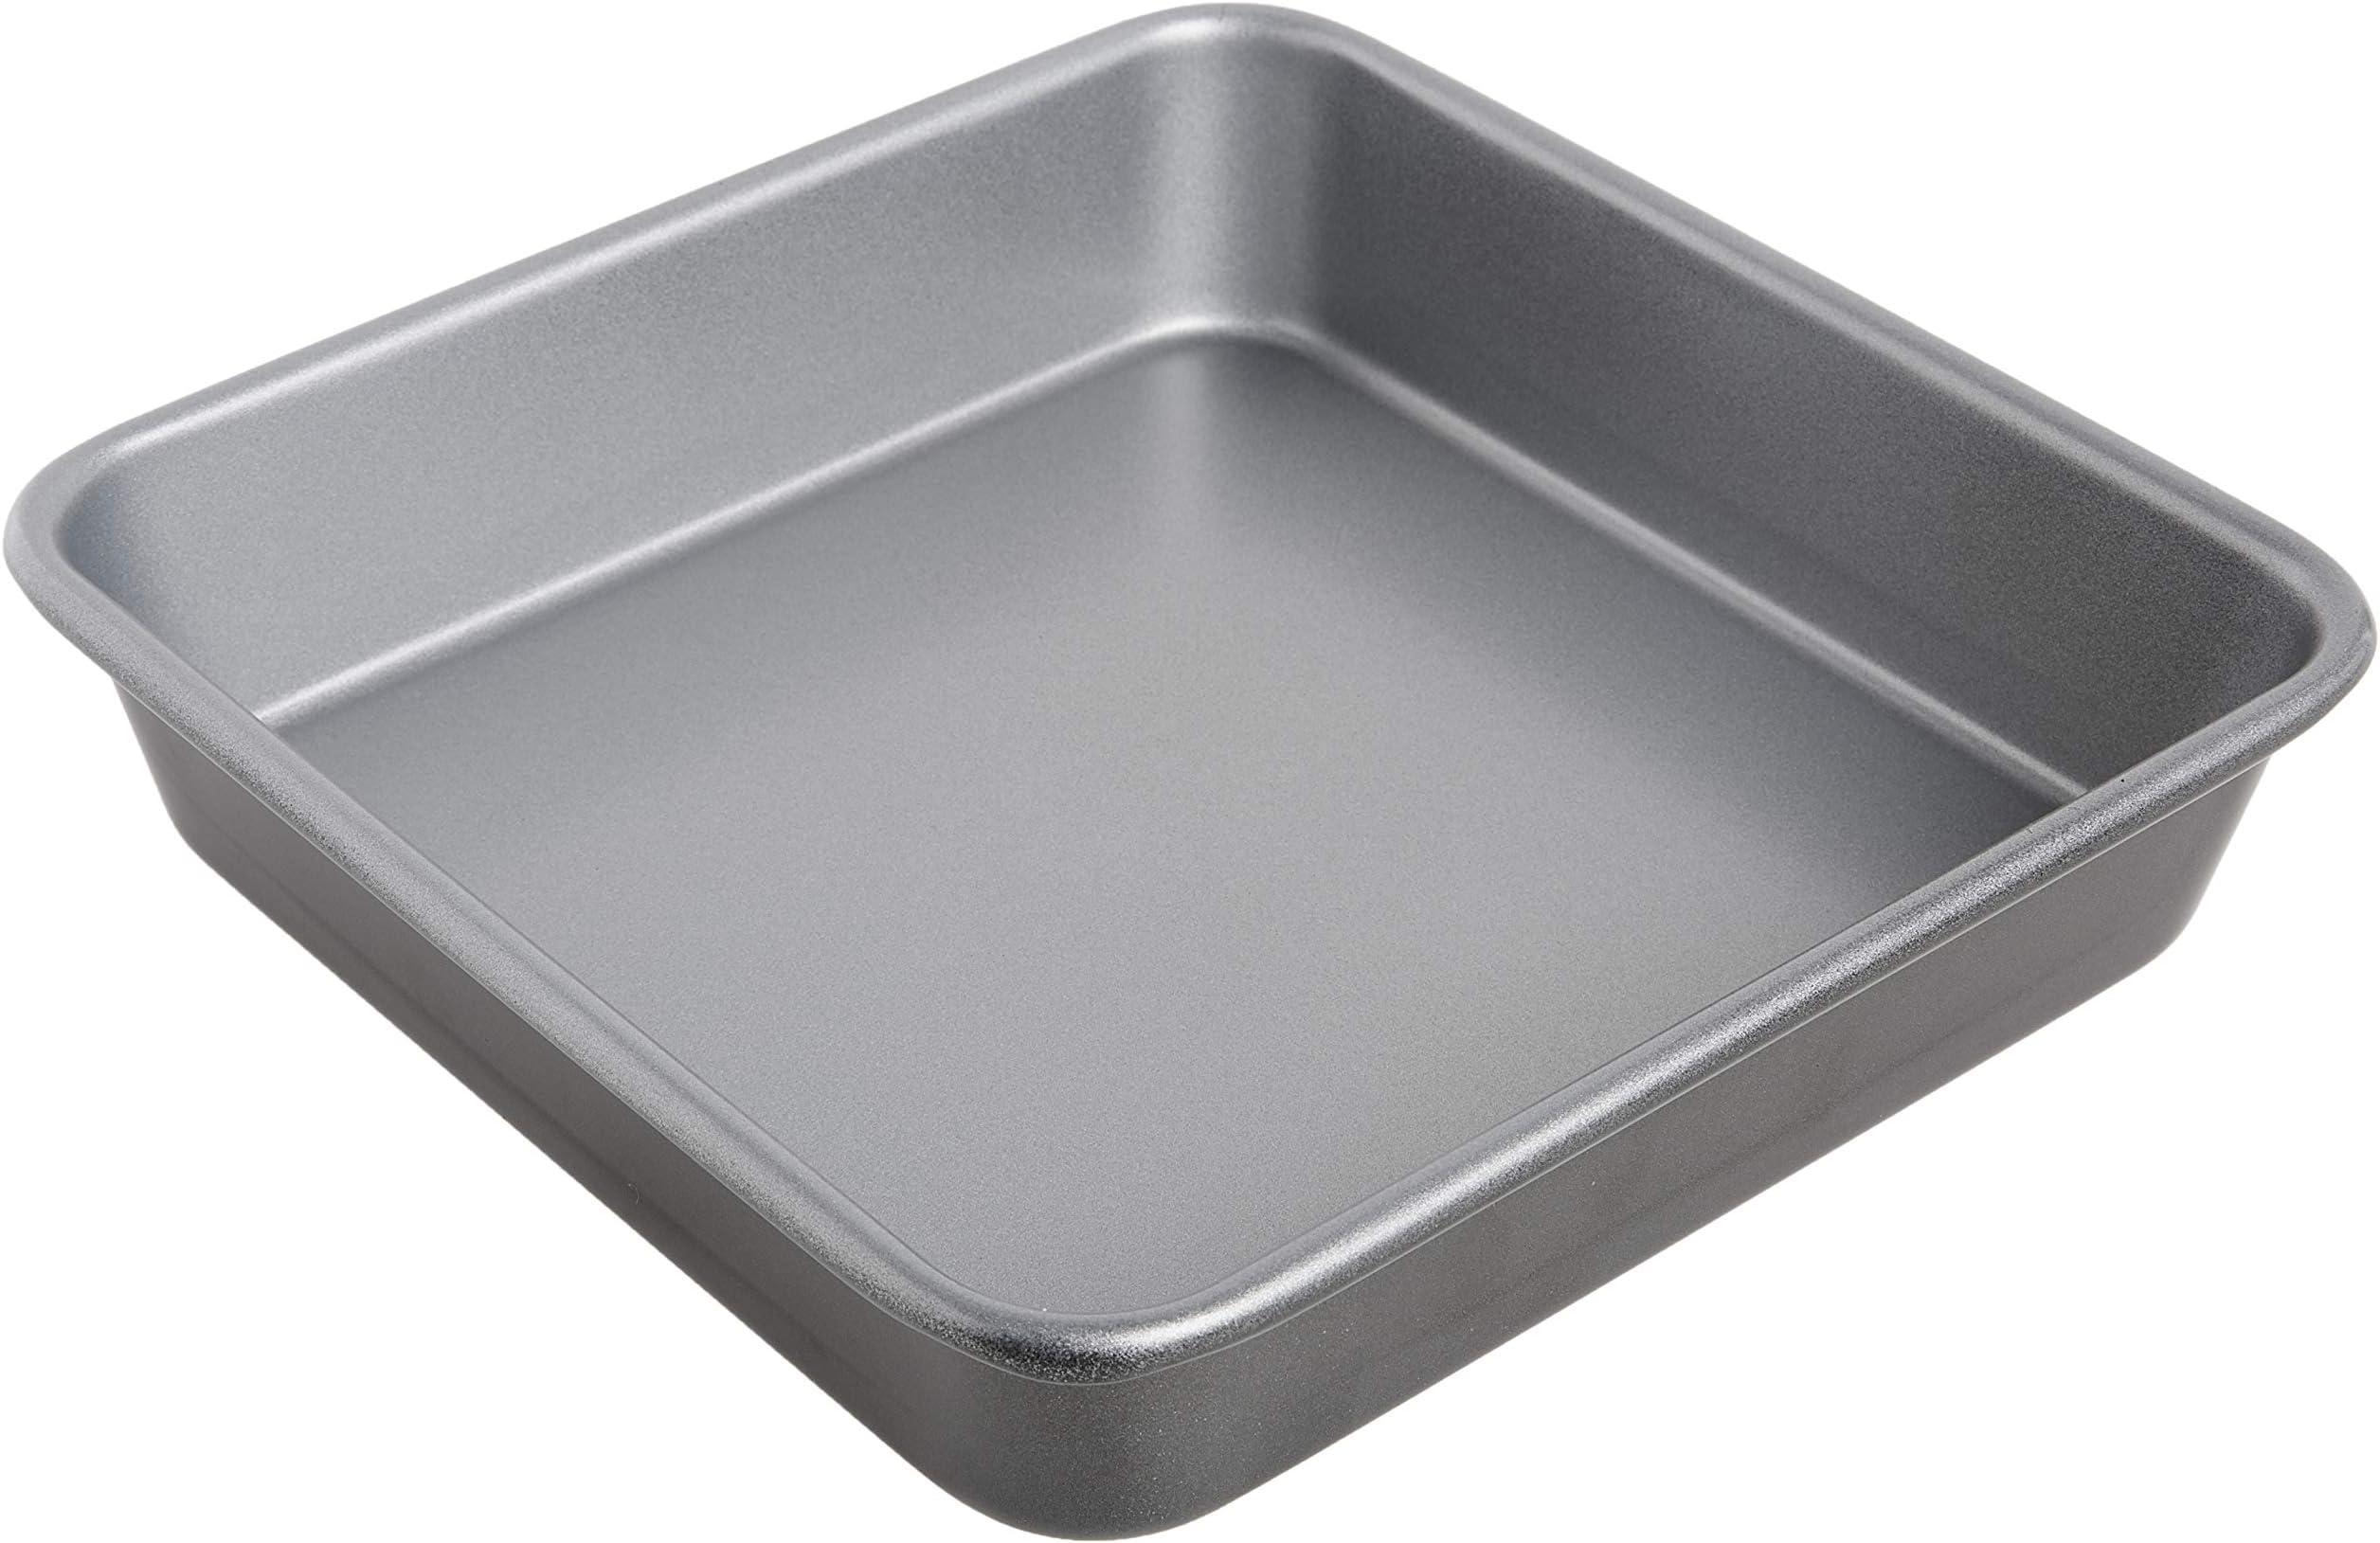 Cuisinart 9-Inch Chef's Classic Nonstick Bakeware Square Cake Pan, Silver